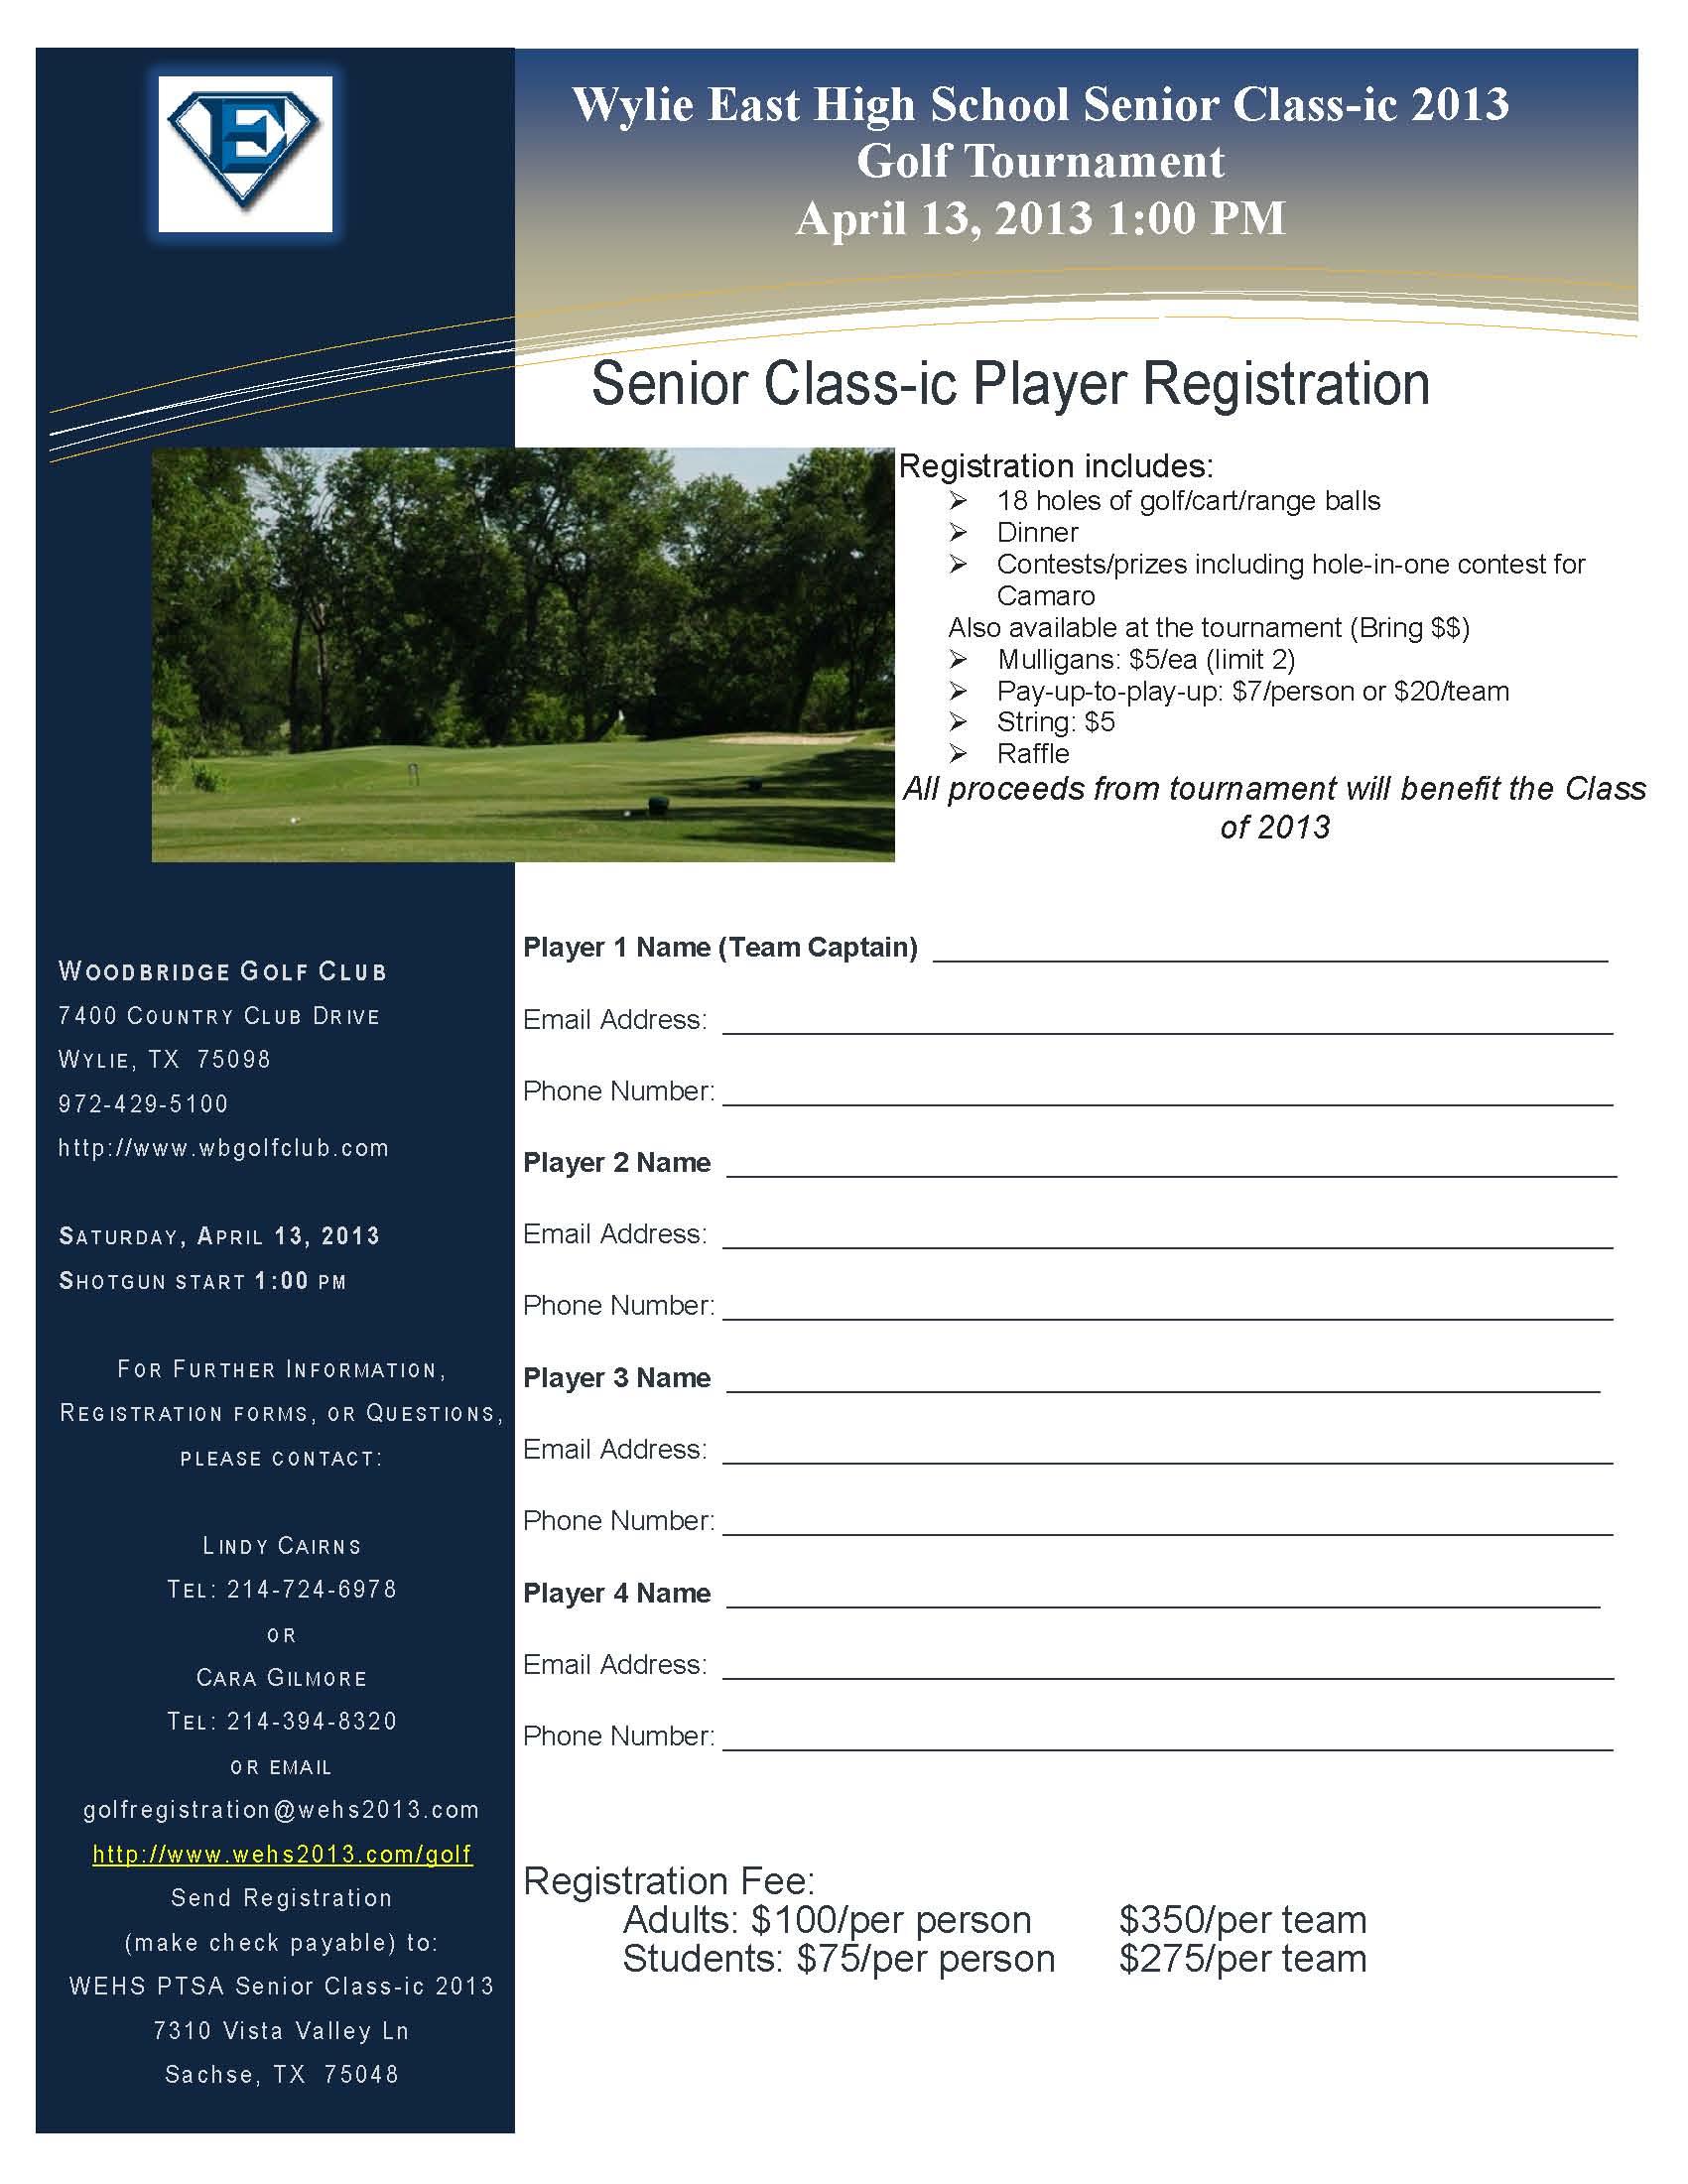 wylie east senior class ic golf tournament april 13 blue ribbon news